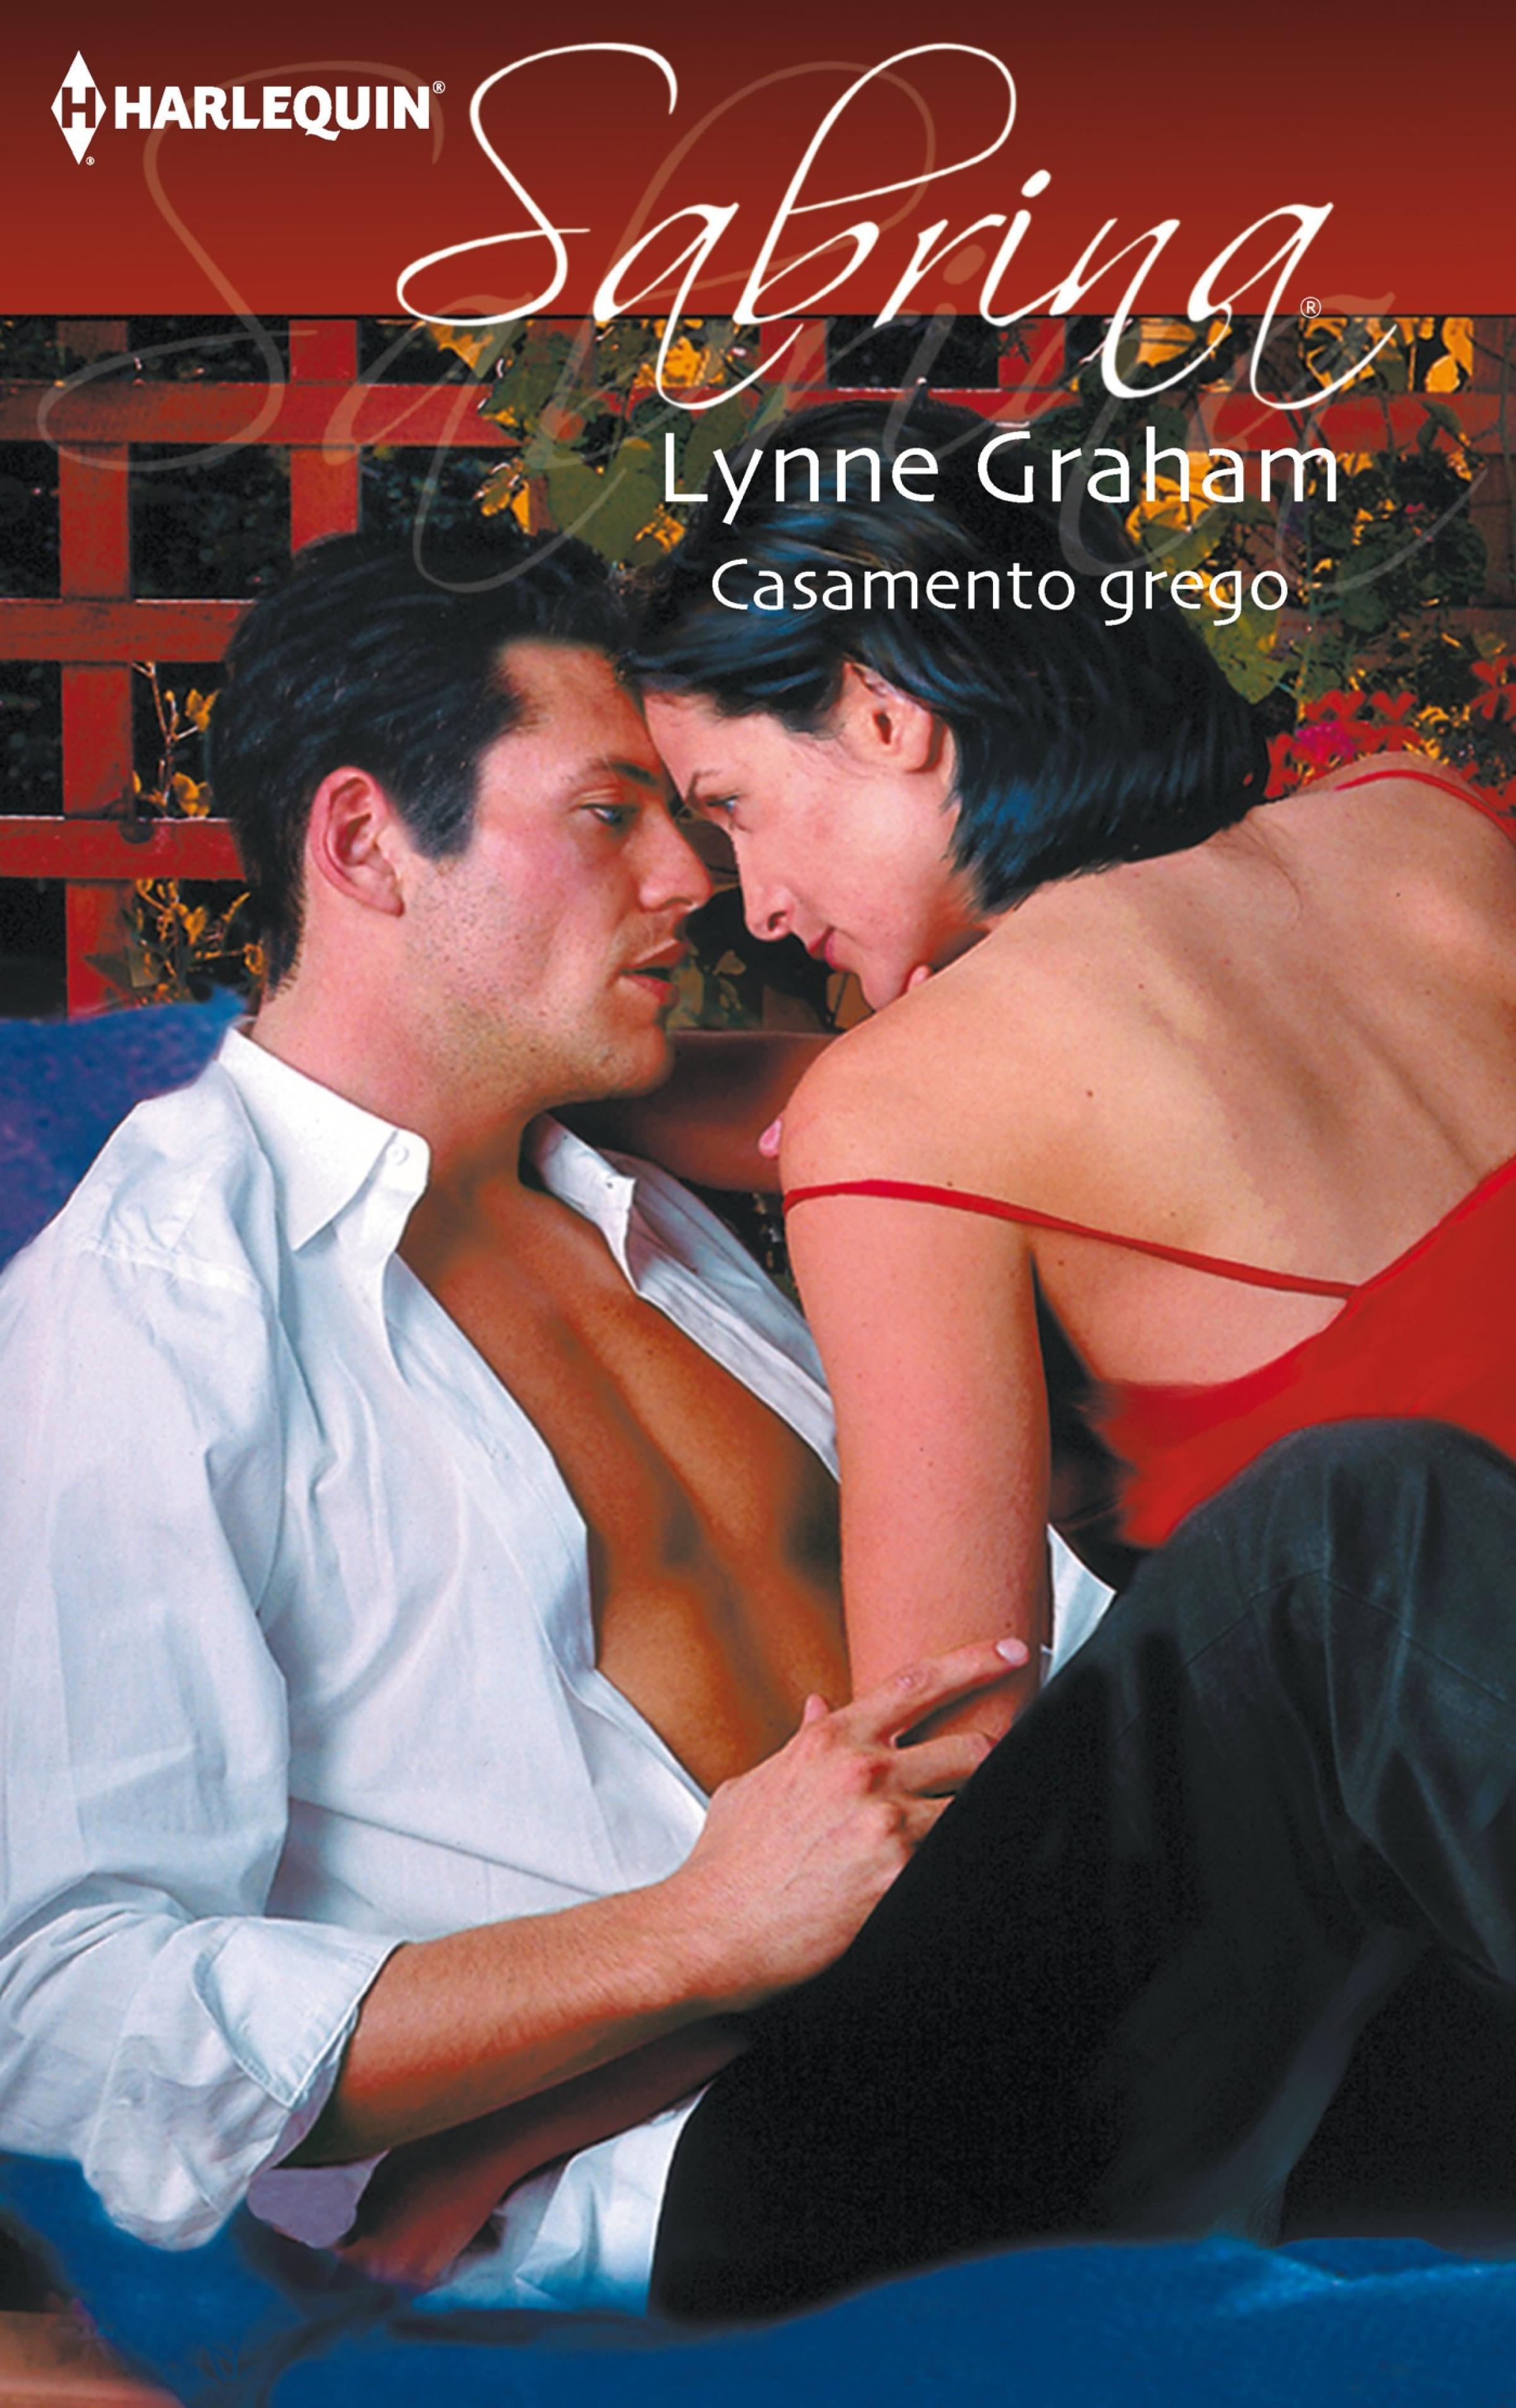 Lynne Graham Casamento grego lynne graham bittersweet passion